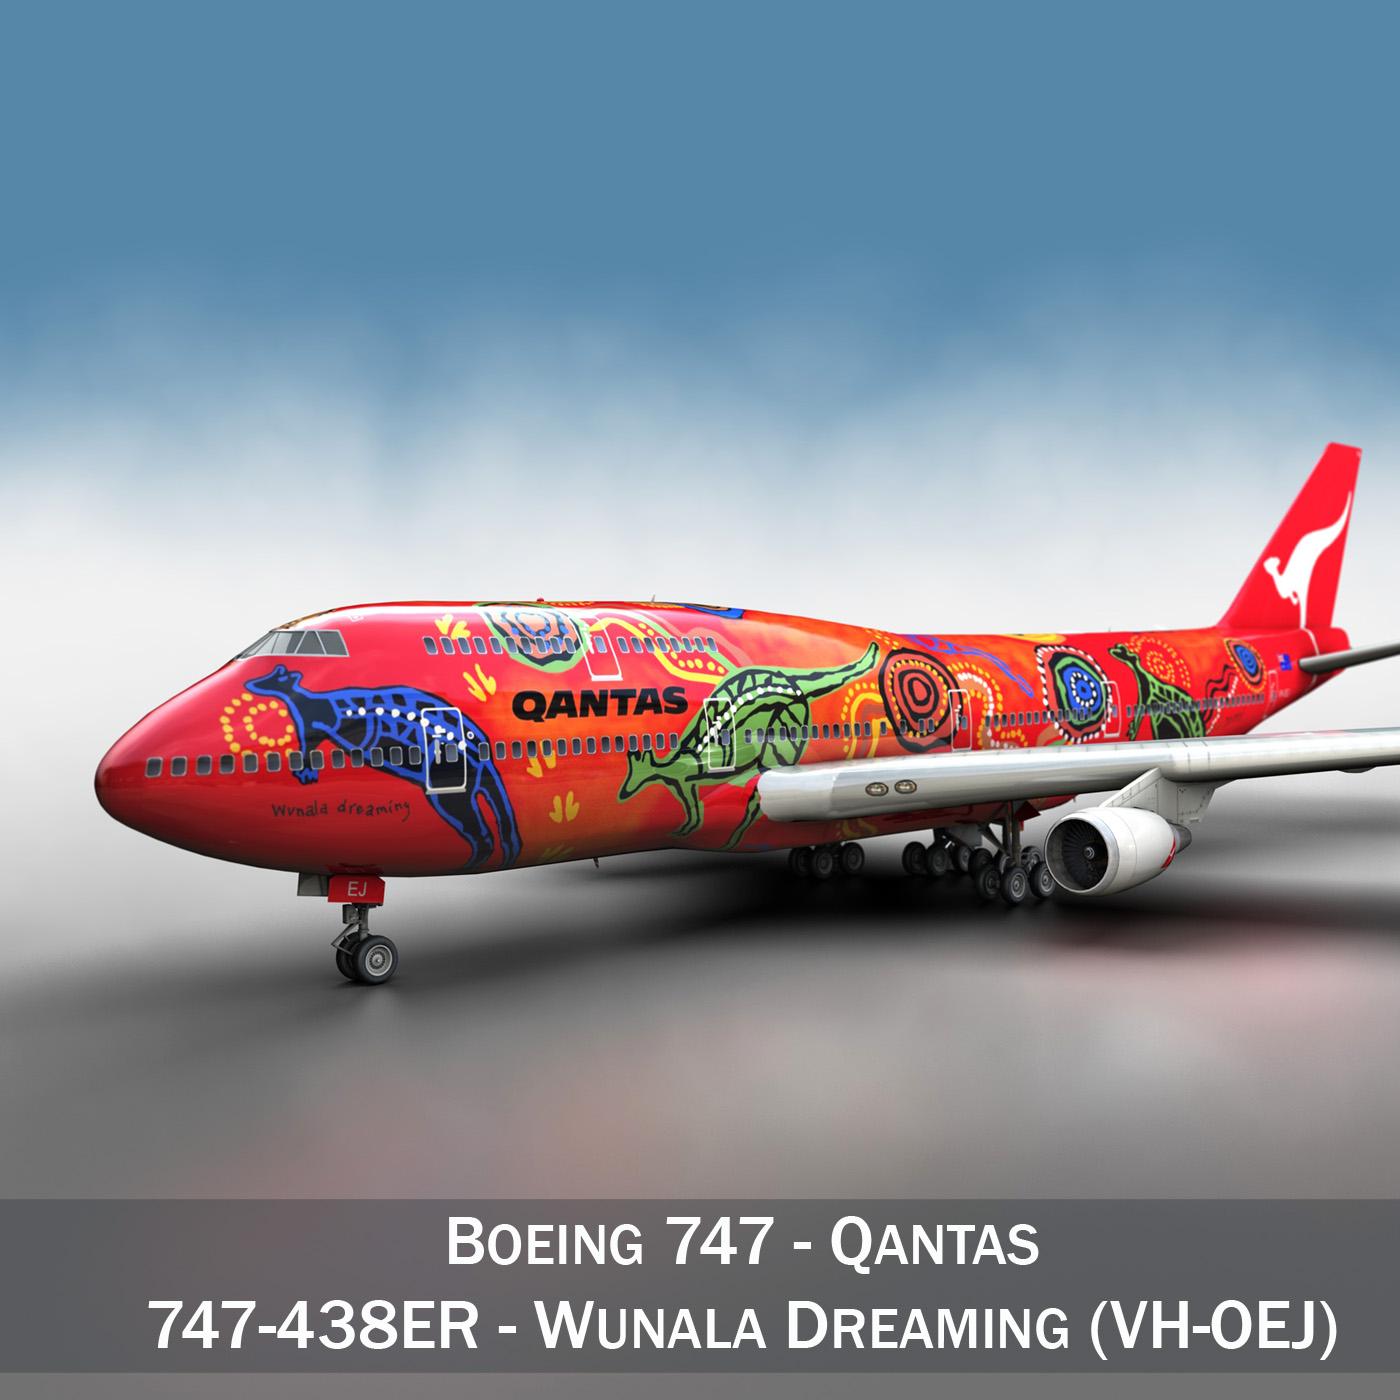 boeing 747 qantas wunala dreaming 3d model 3ds fbx c4d lwo obj 281781